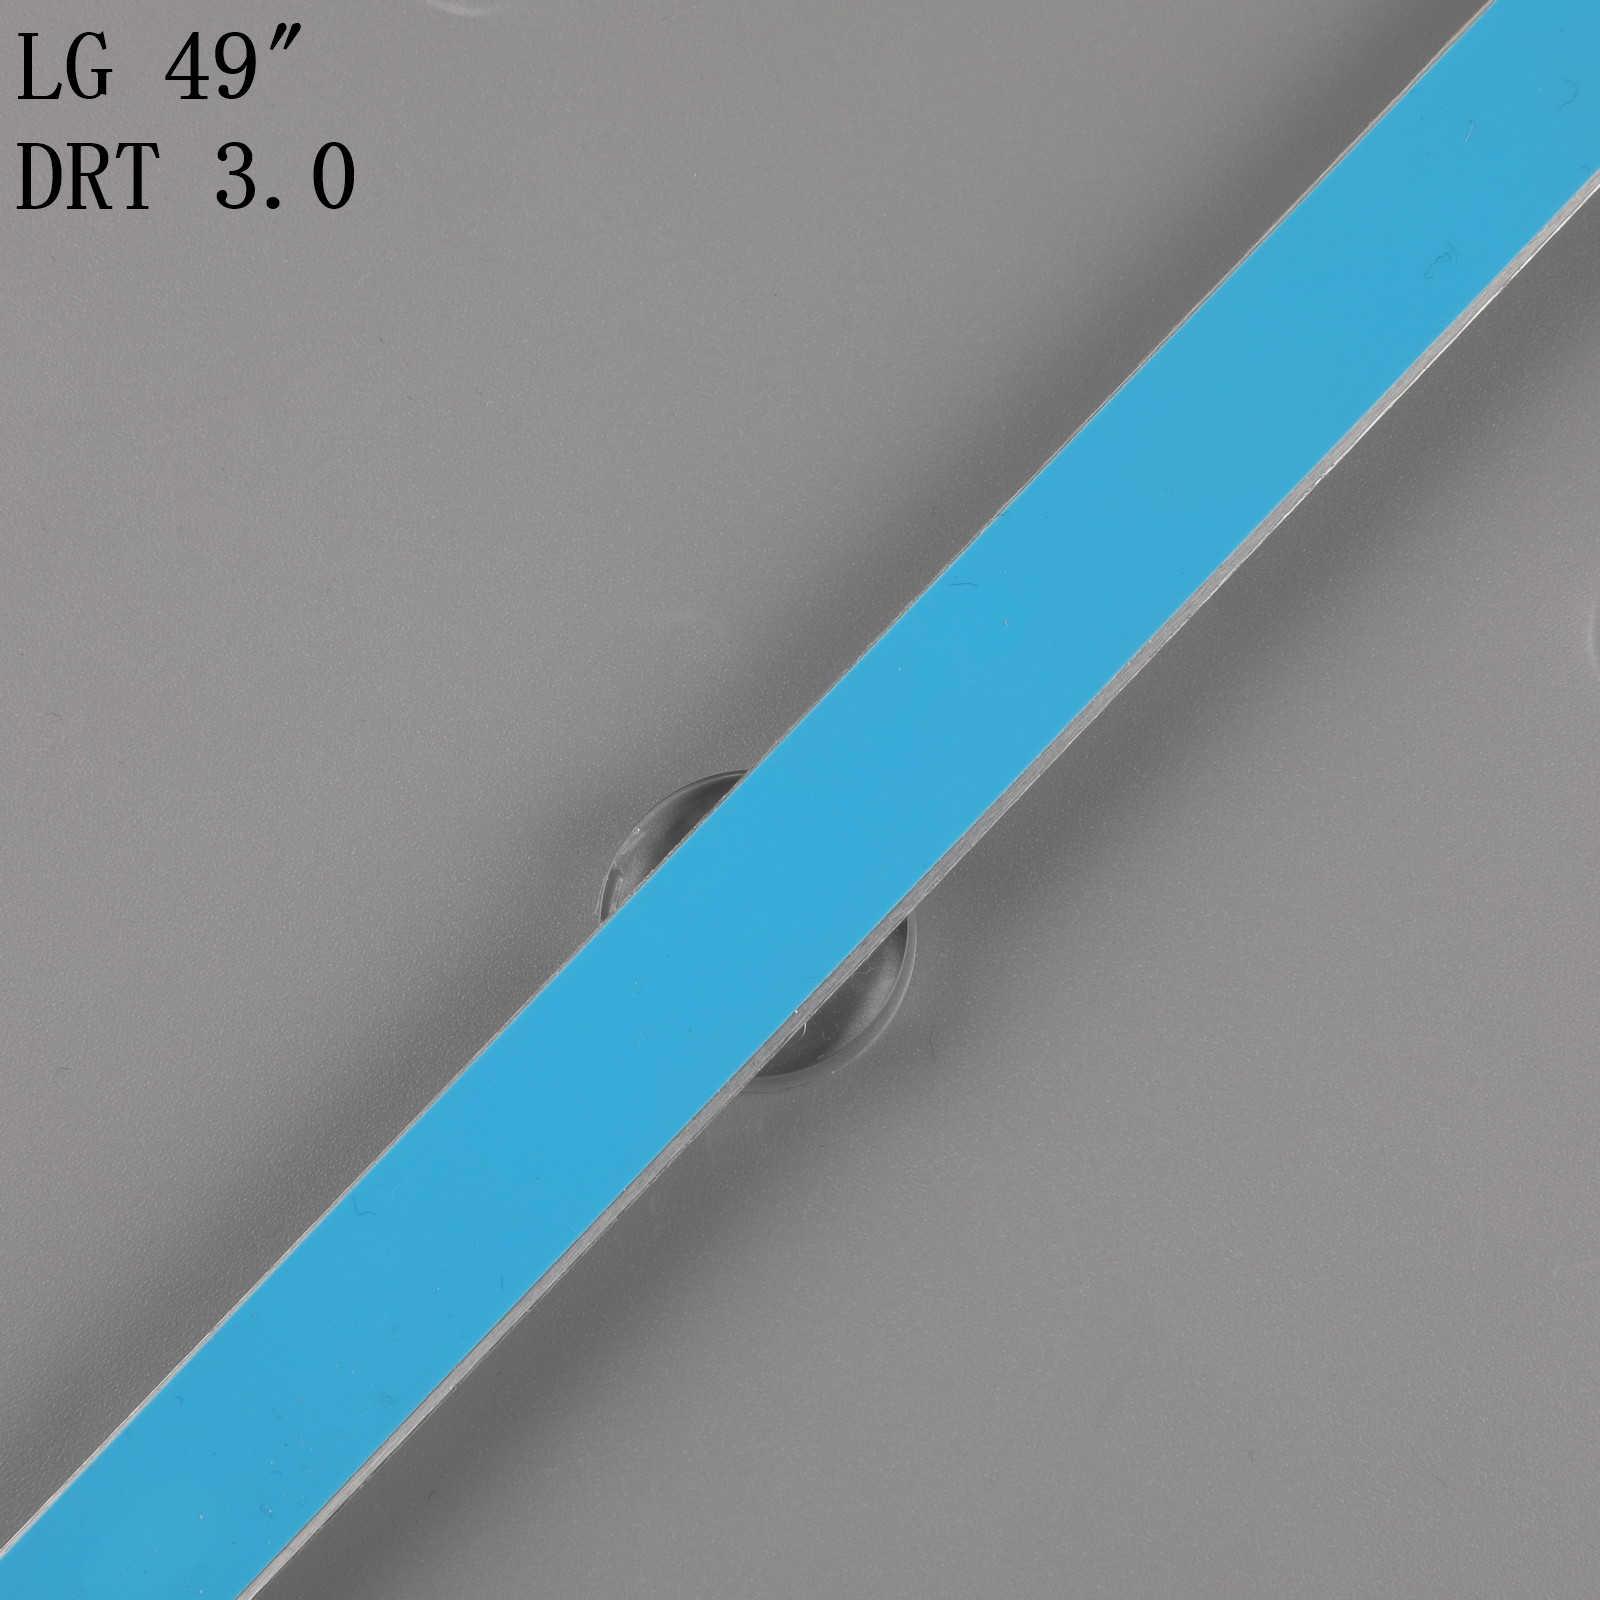 "LED תאורה אחורית מנורת רצועת עבור LG Innotek DRT 3.0 49 ""AB 49LB552 49LB629V AGF78402201 49LB561U 49LB582V 49LF620V 49UF6430 49LB620V"